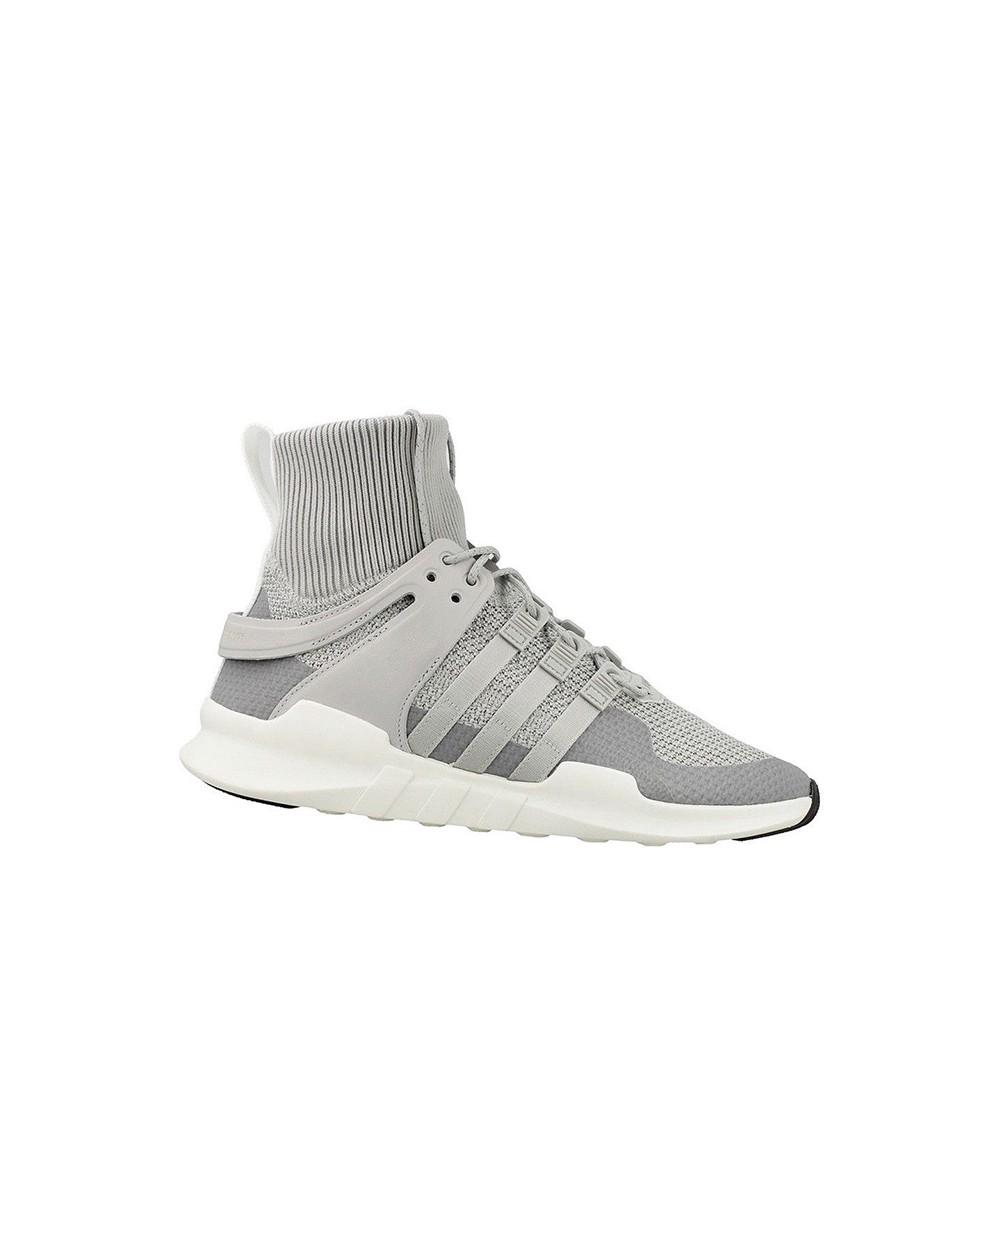 Eqt Sneakerbz0641 Originals Support Adidas Adv Winter Nowy tQxrChosdB